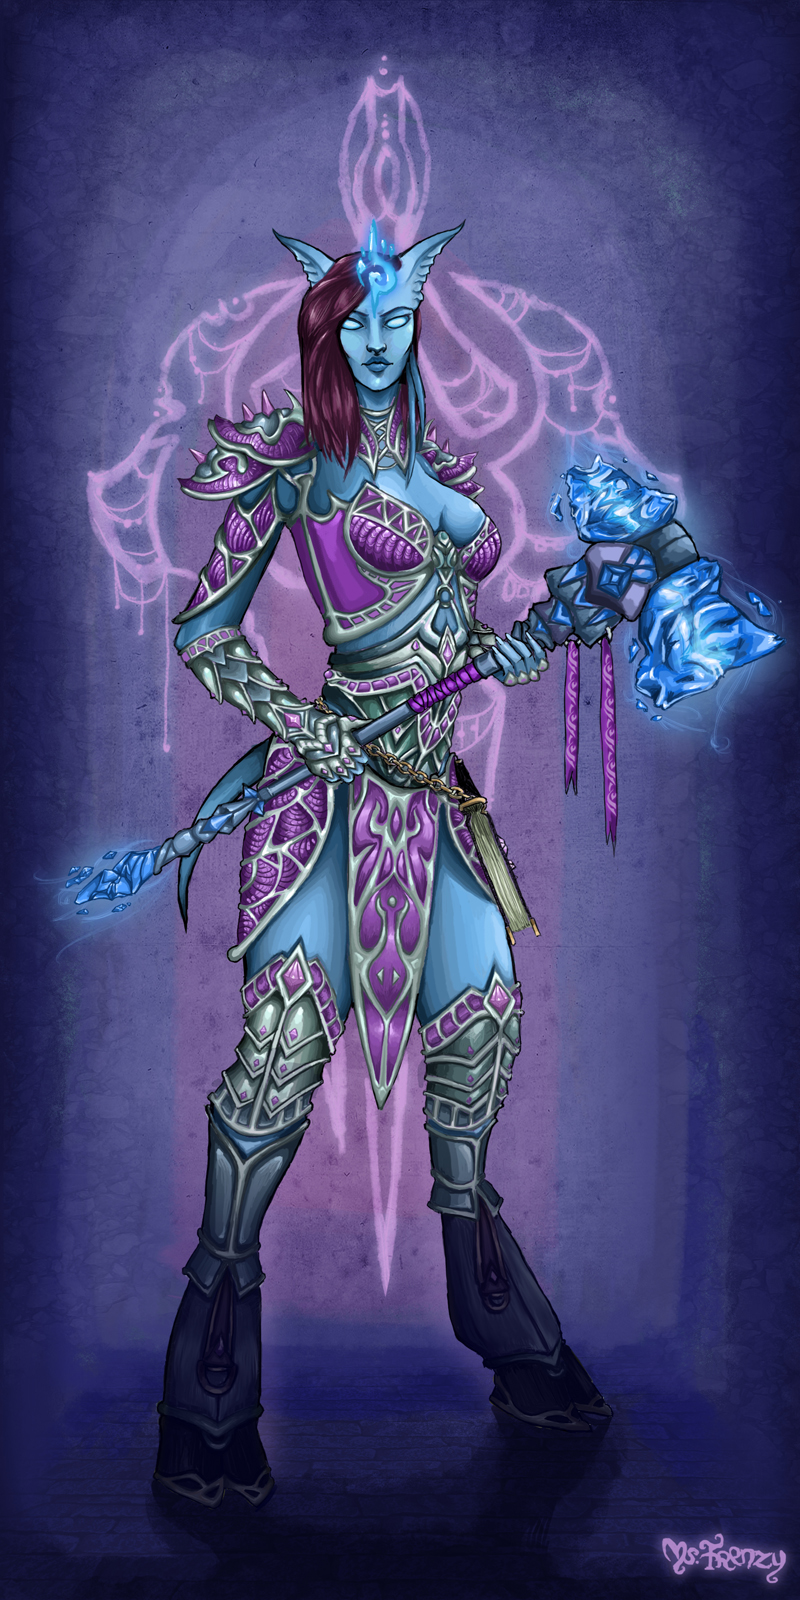 Blood elf and night elf threesome in whorecraft vr - 3 part 7